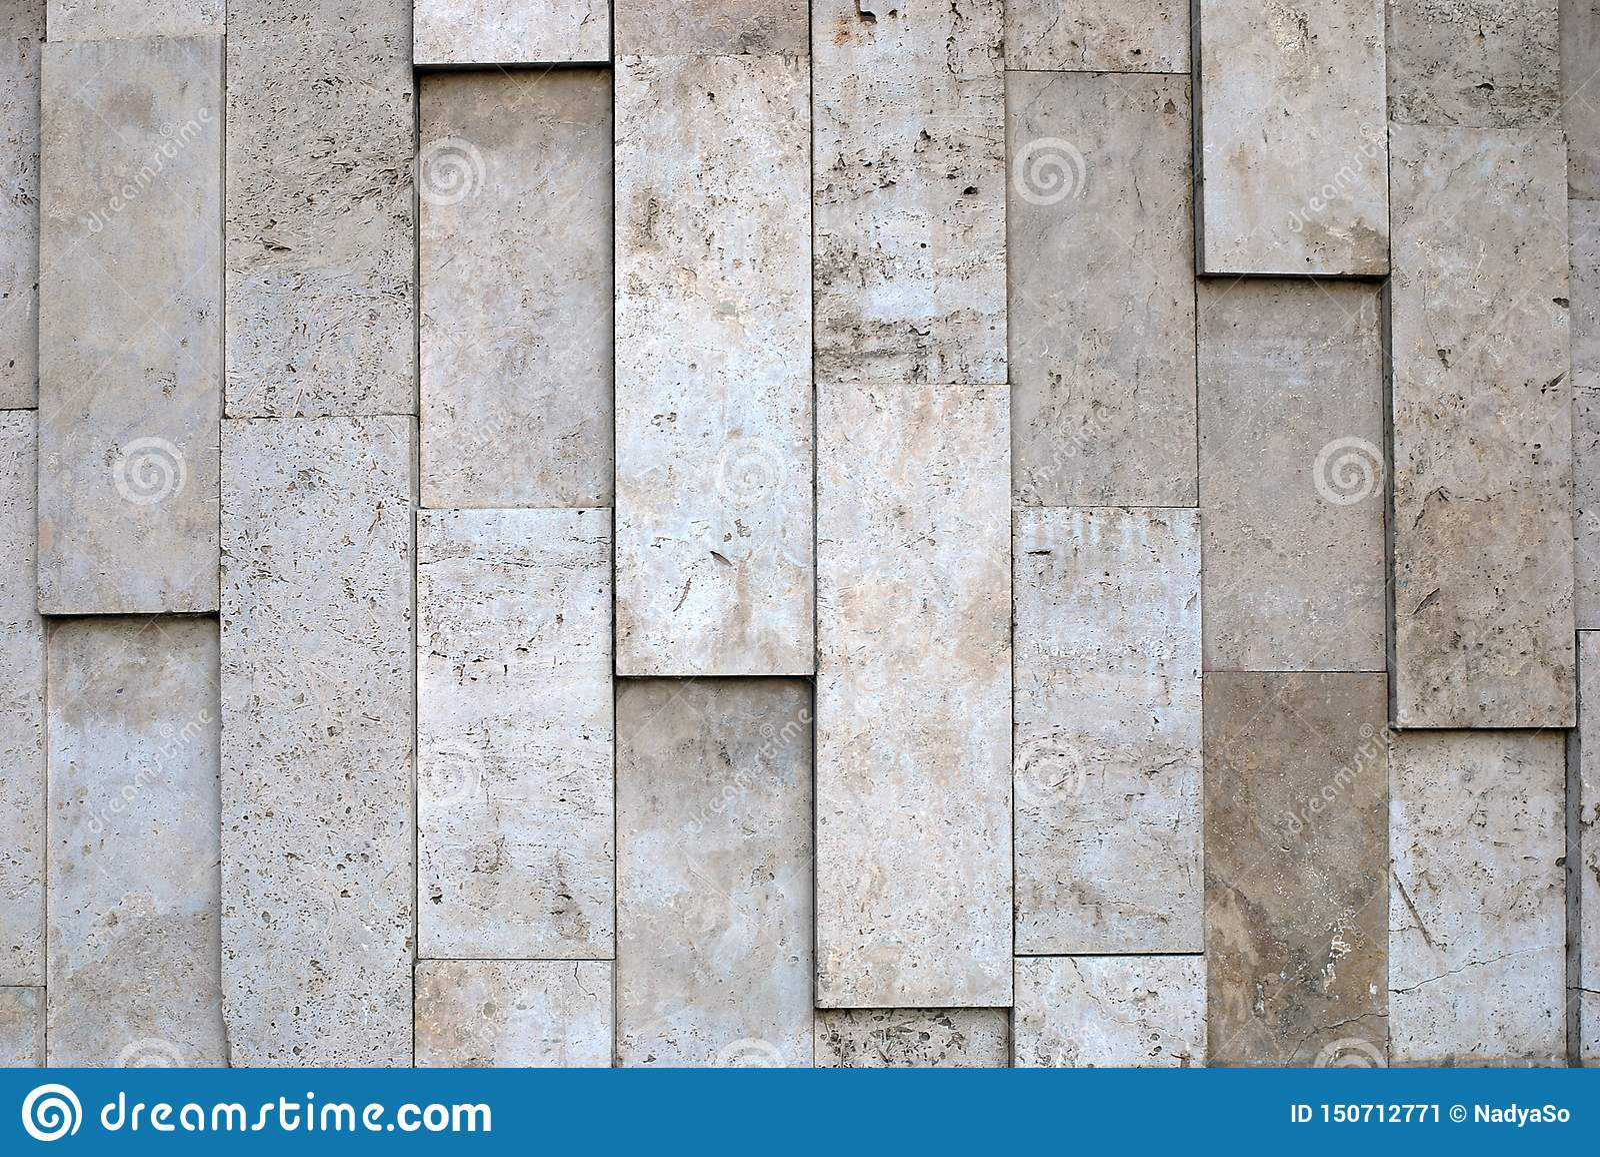 Textura desigual natural da parede de pedra do material poroso das cores bege da escala